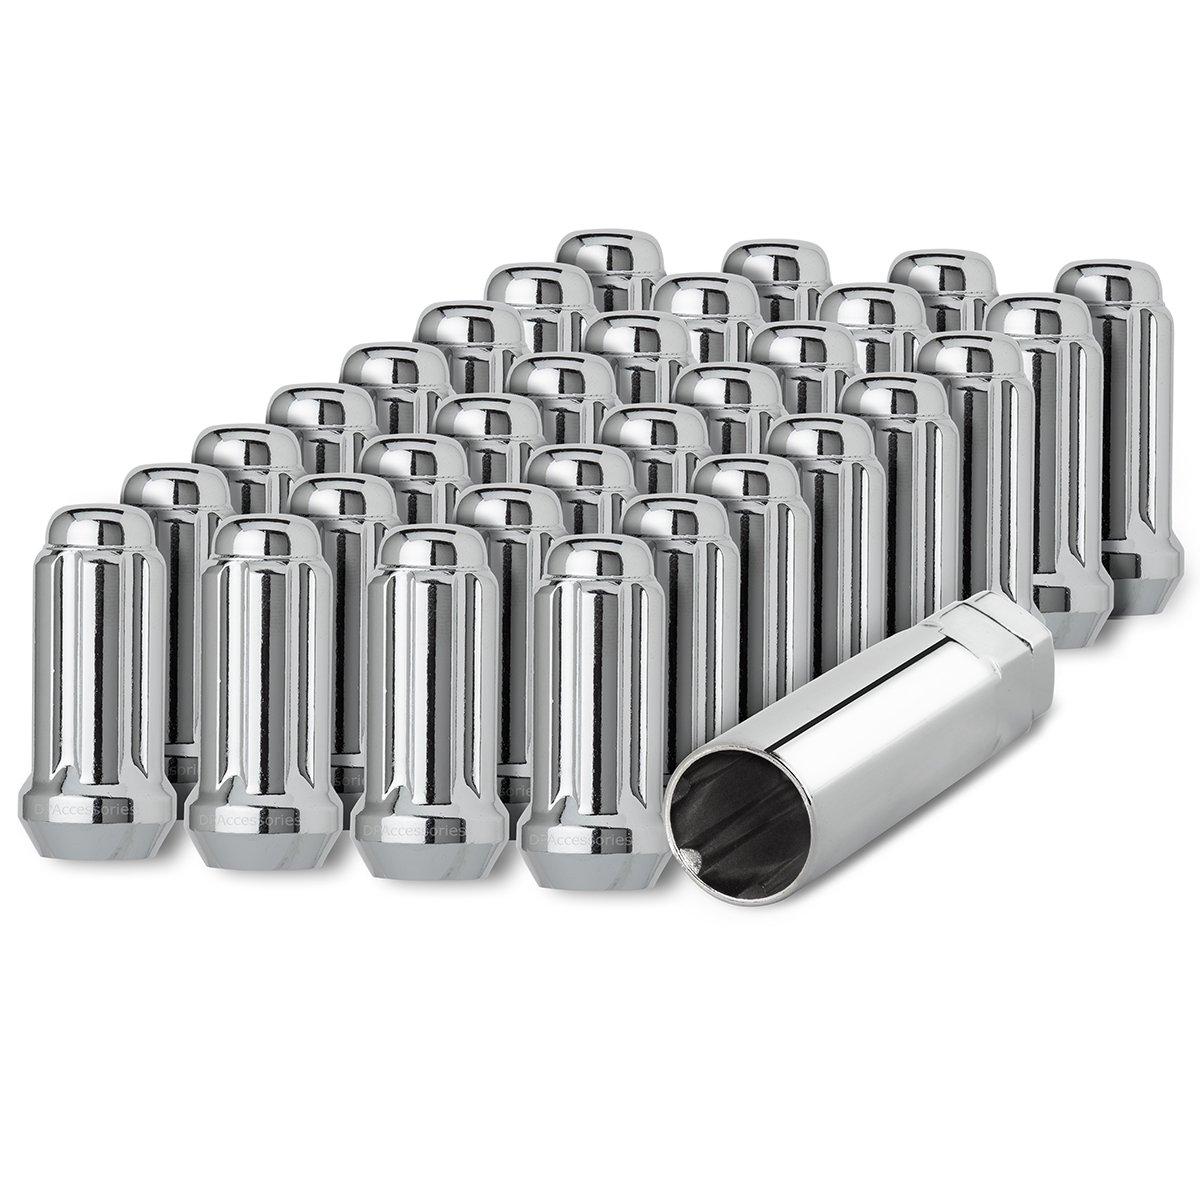 DPAccessories D5118-2305/32 32 Chrome 14x1.5 Closed End Duplex XL Spline Lug Nuts for Aftermarket Wheels Wheel Lug Nut by DPAccessories